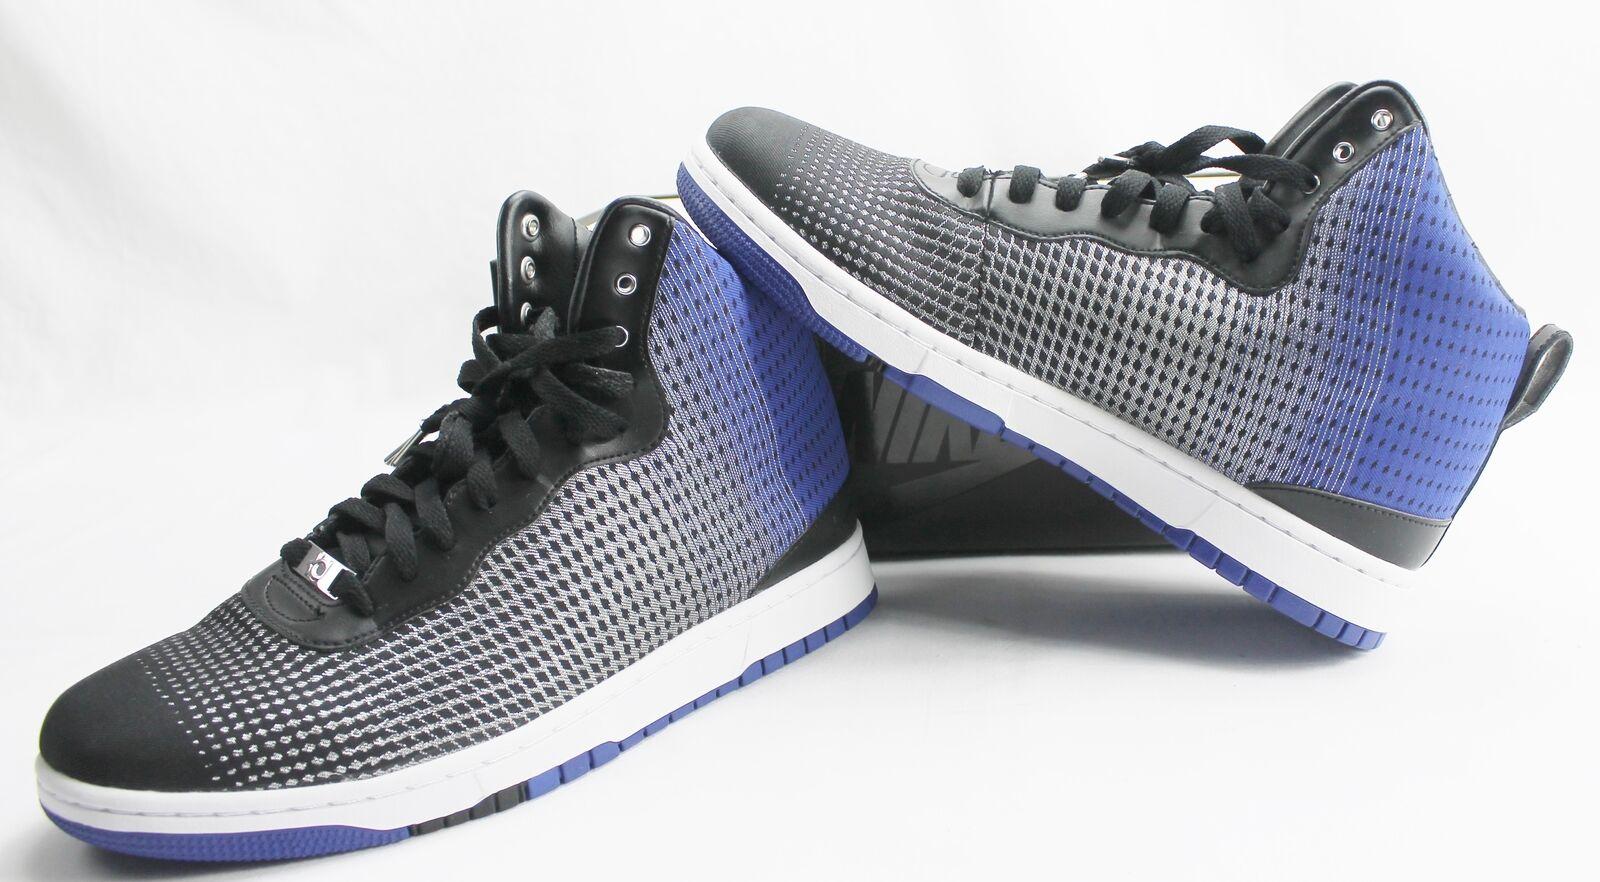 Nike Kd 8 Lifestyle Durant Größe 10.5 Balance Kevin Durant Lifestyle Sneakers Königsblau / NT 02bbab